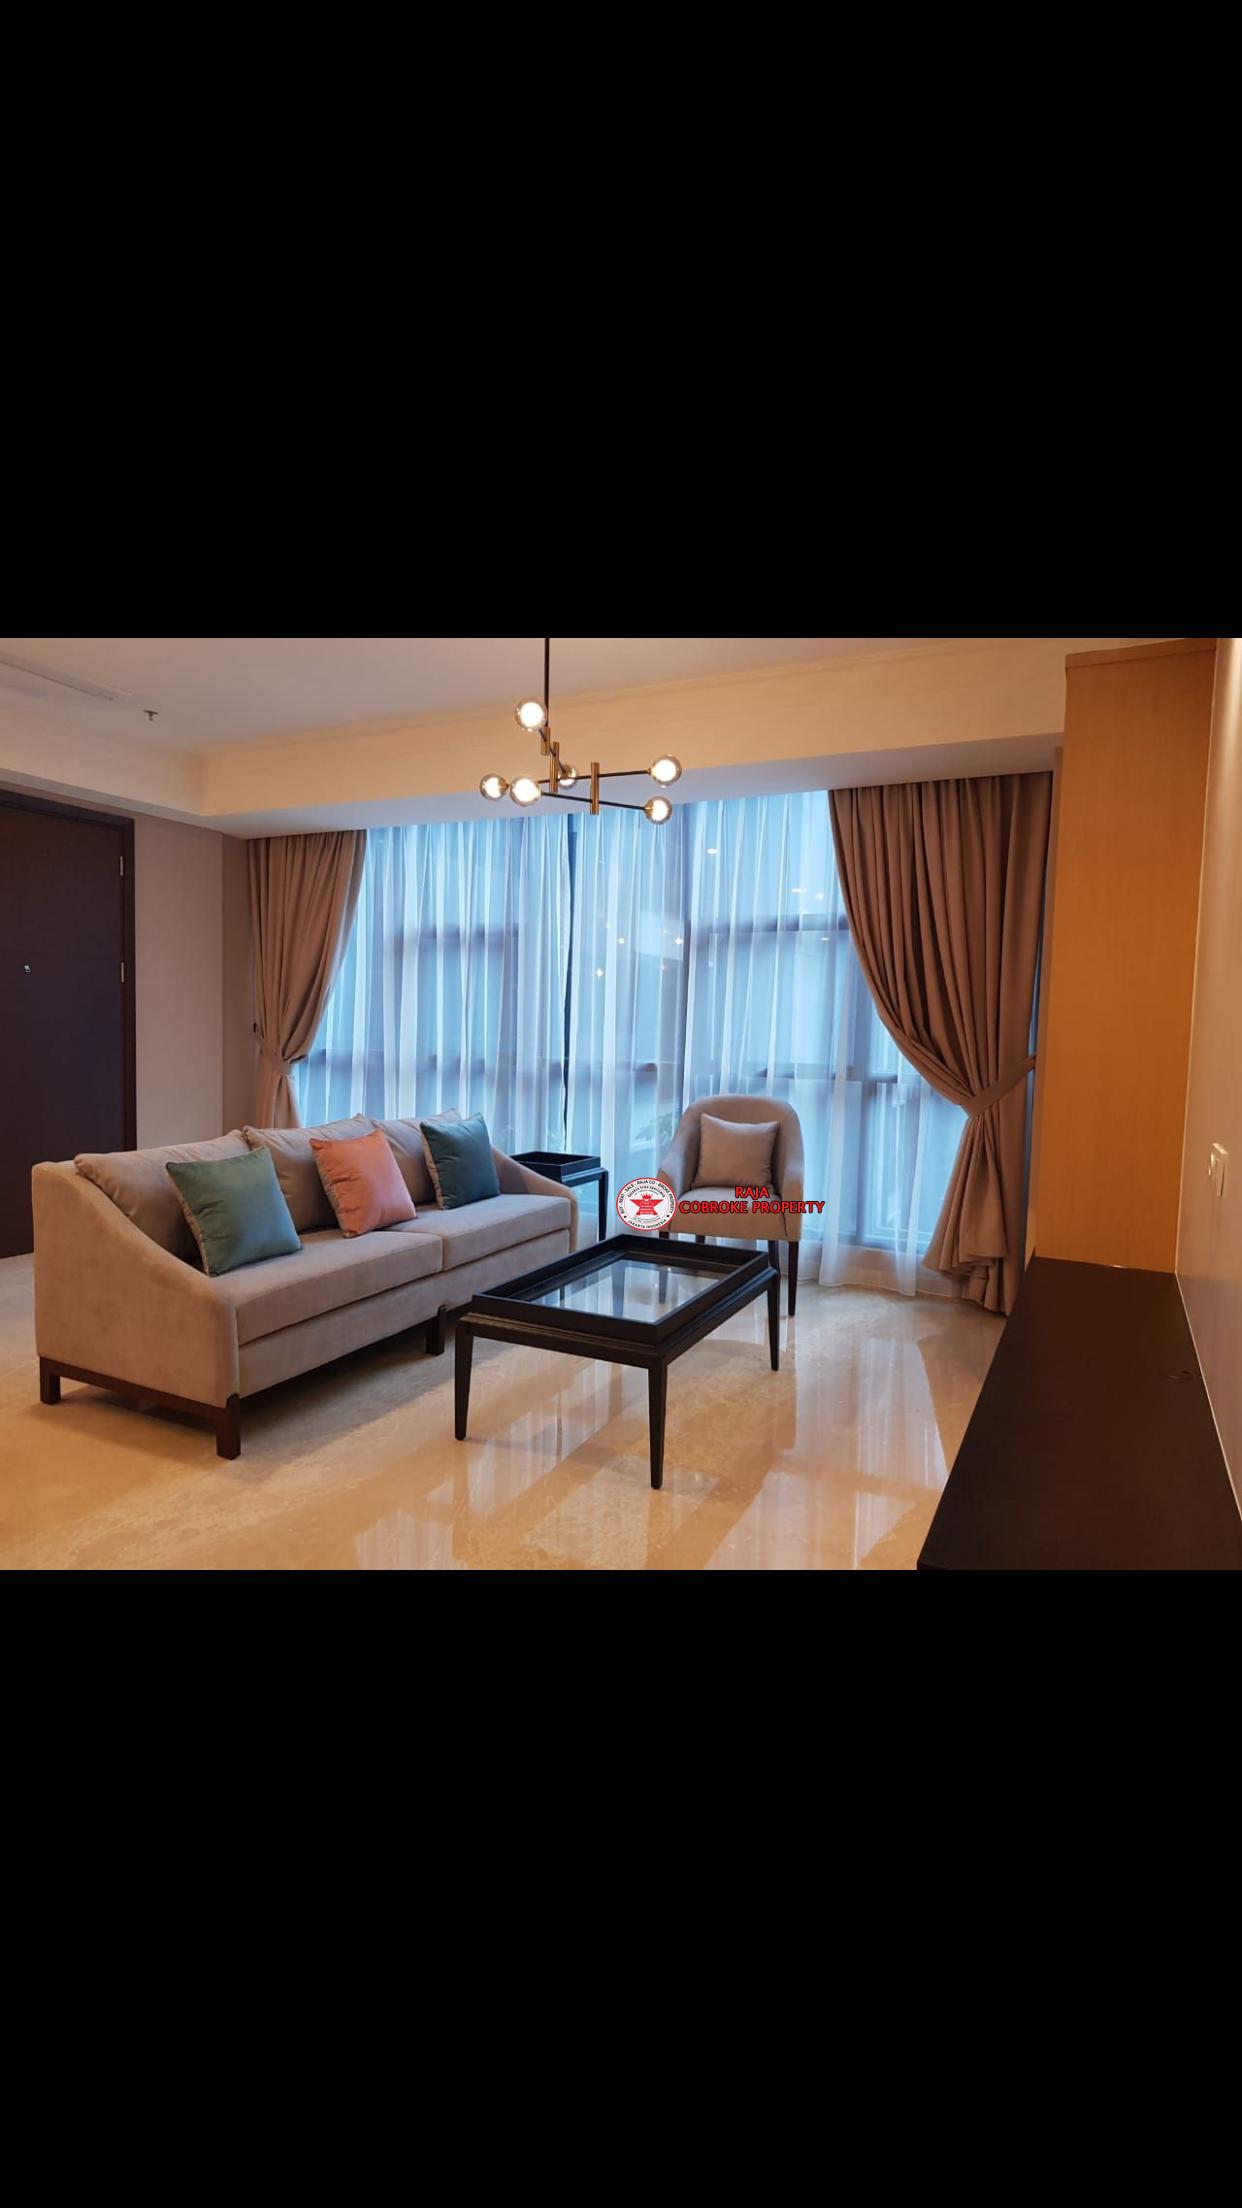 3BR Private Lift Bella CasaGrande Residence pool view  apartemen mega kuningan,apartemen casablanca casagrande residence,apartemen kuningan city denpasar residence 490B4755 C9D1 40CE B62C 8B39CDCA1FDF